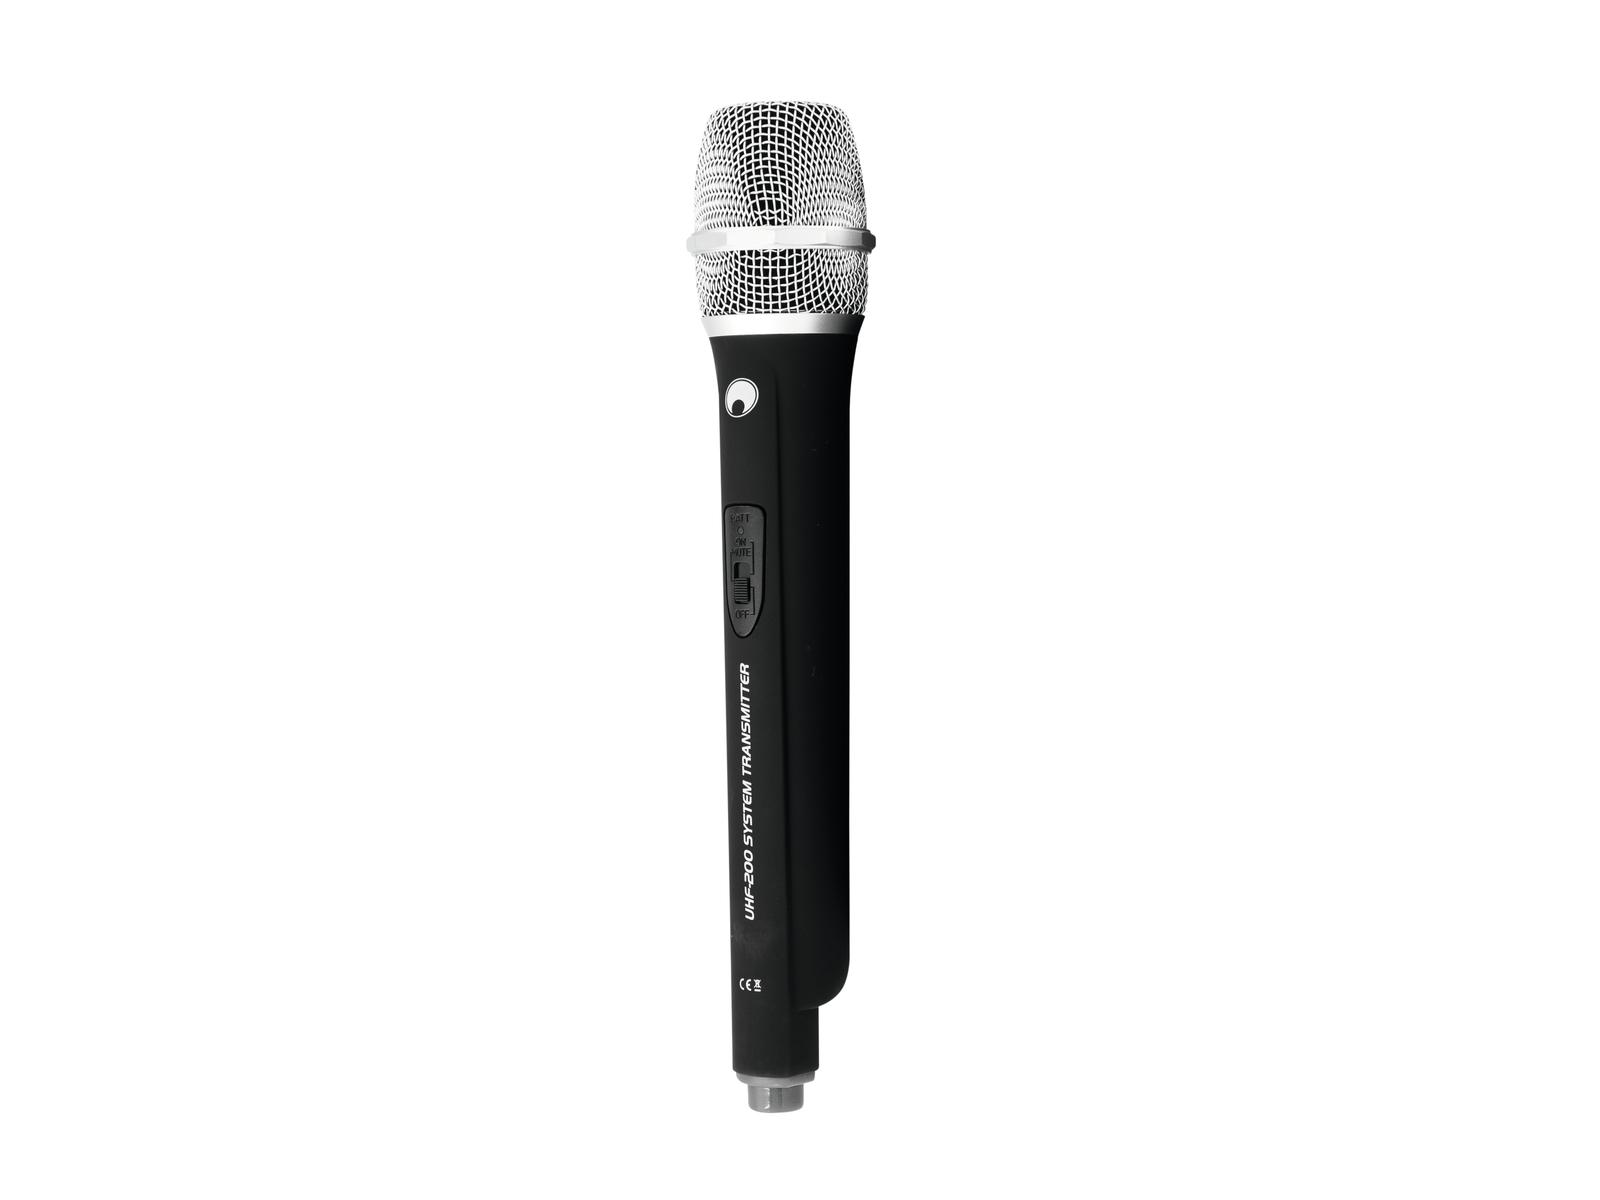 OMNITRONIC Microfono UHF-200 (828.250 MHz) (grigio)